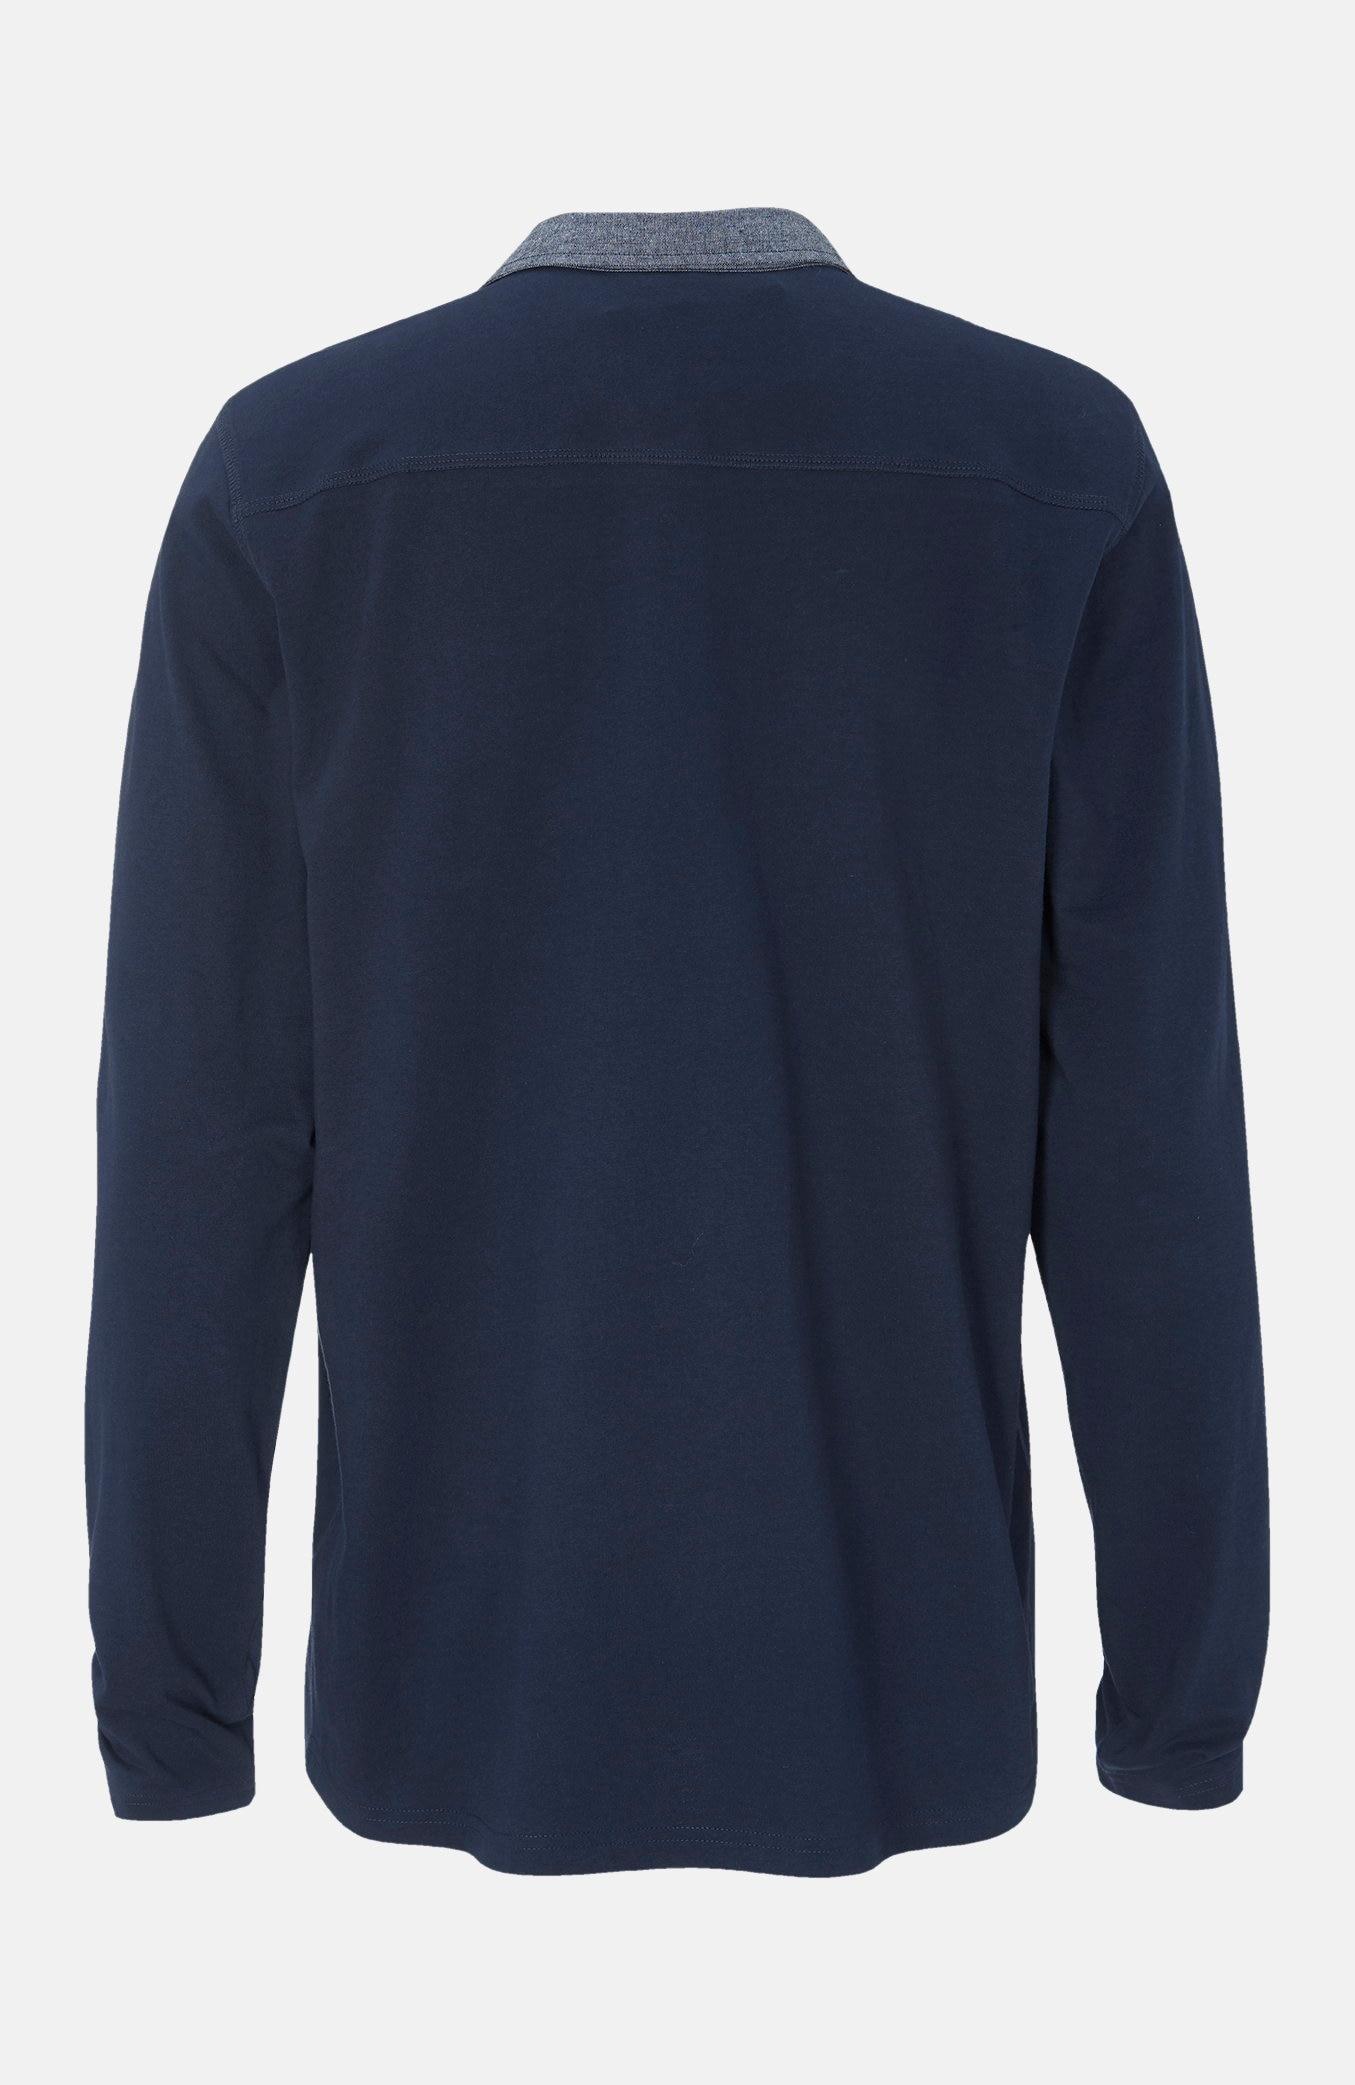 Krae ja pikkade varrukatega mugav džemper